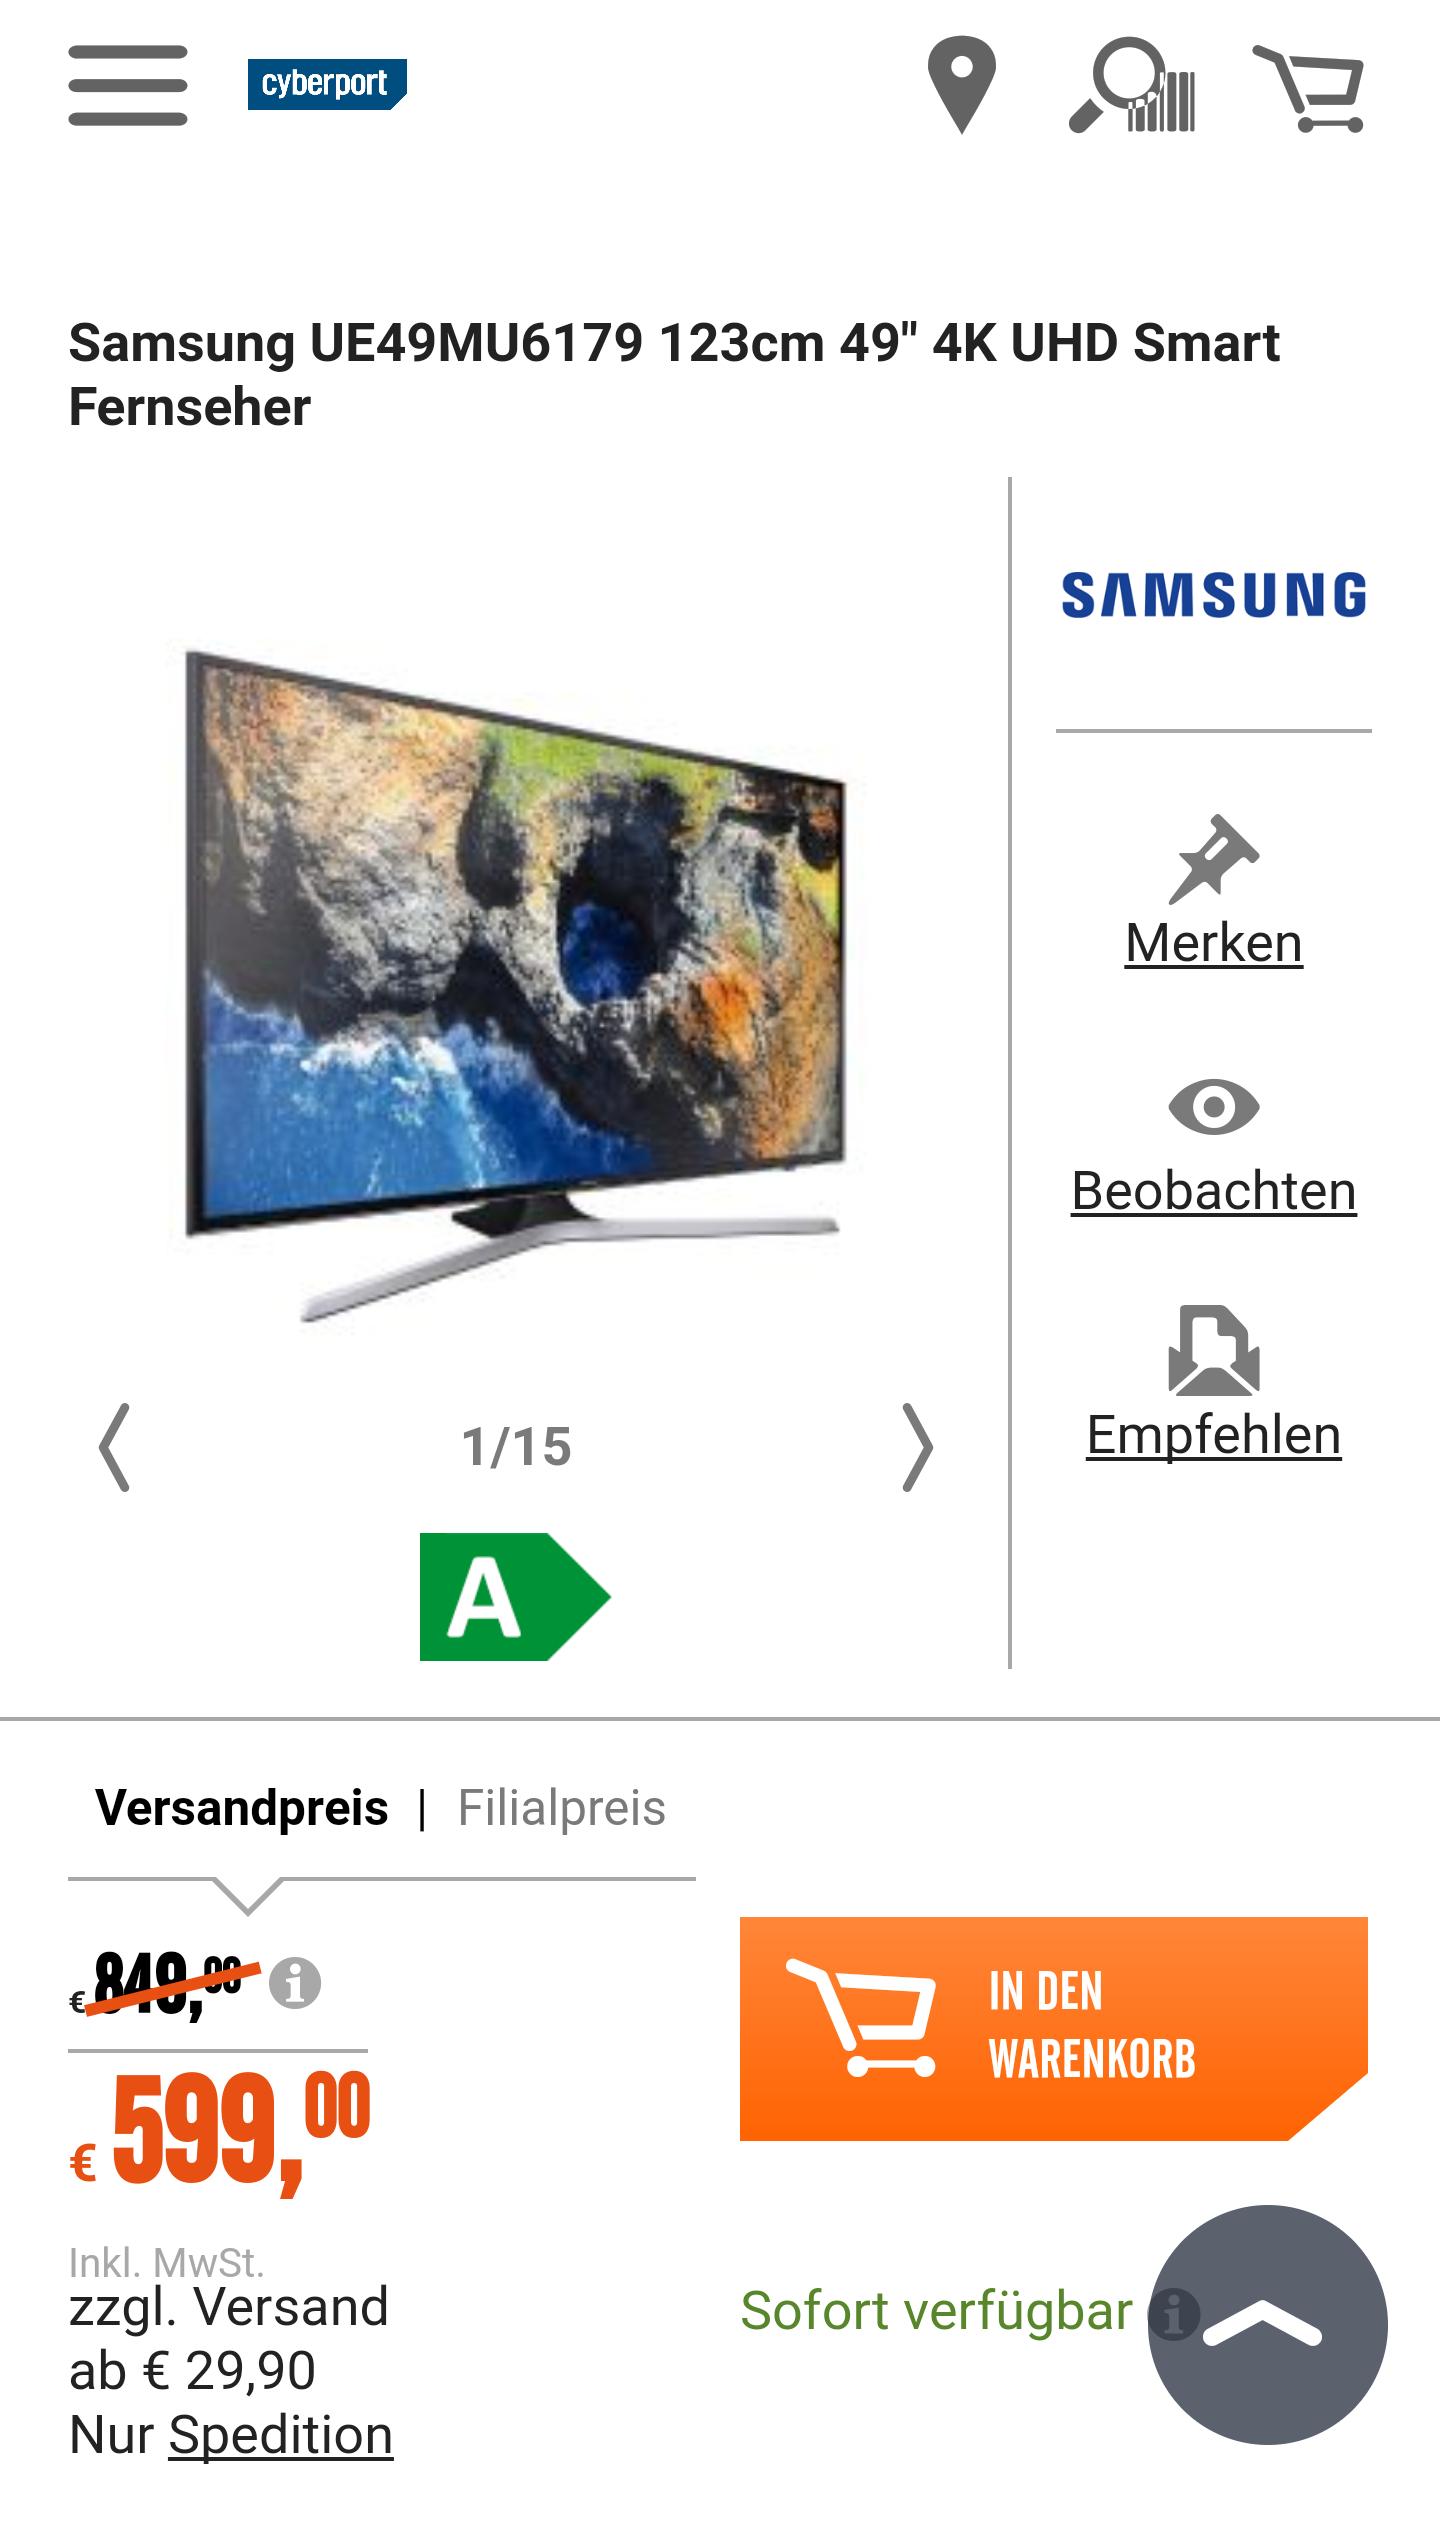 "Samsung UE49MU6179 123cm 49"" 4K UHD Smart Fernseher"